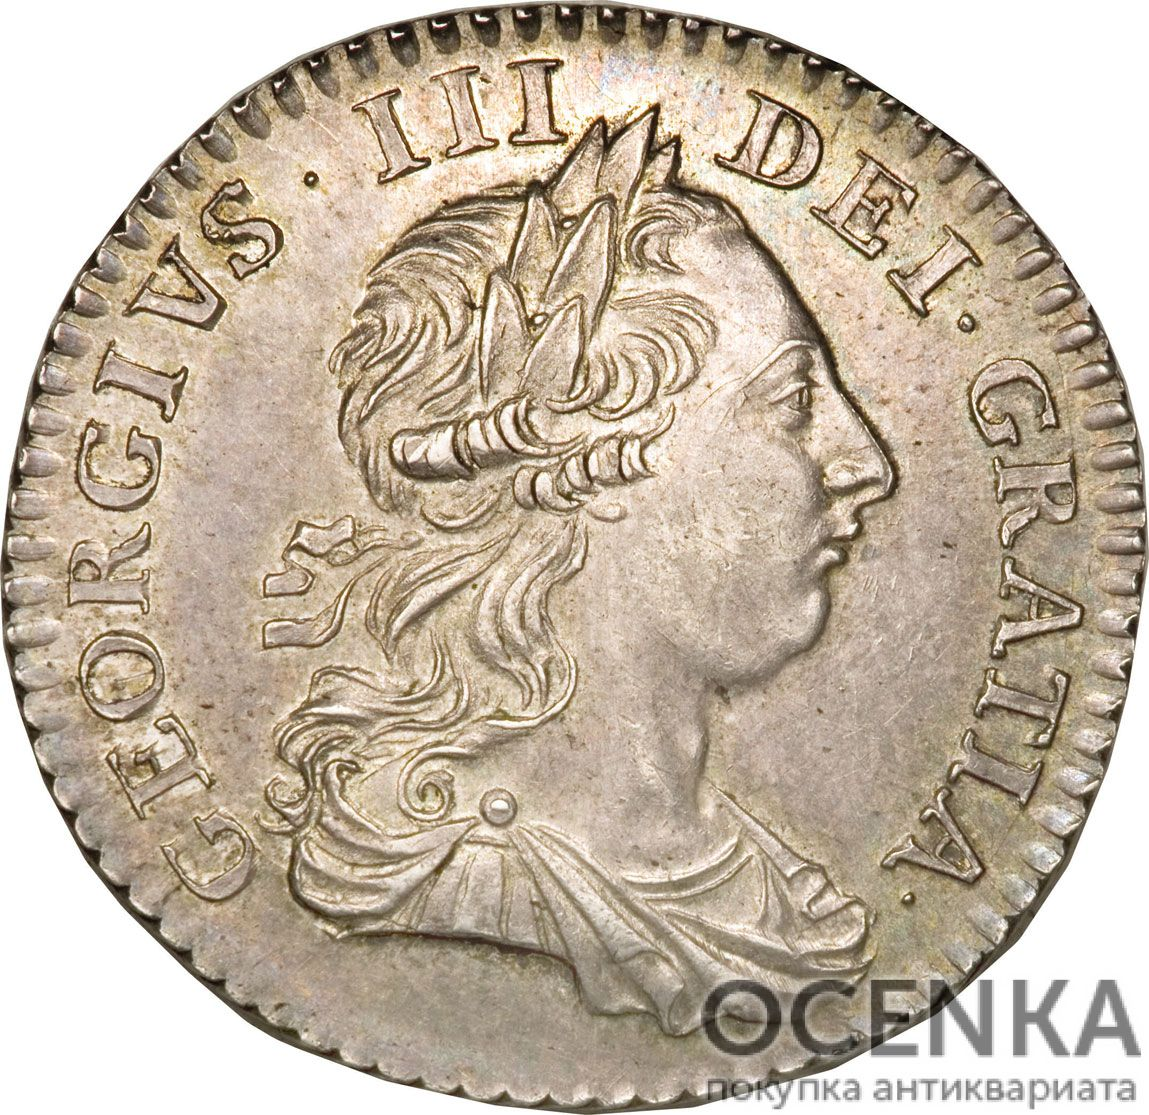 Серебряная монета 1 Шиллинг (1 Shilling) Великобритания - 3